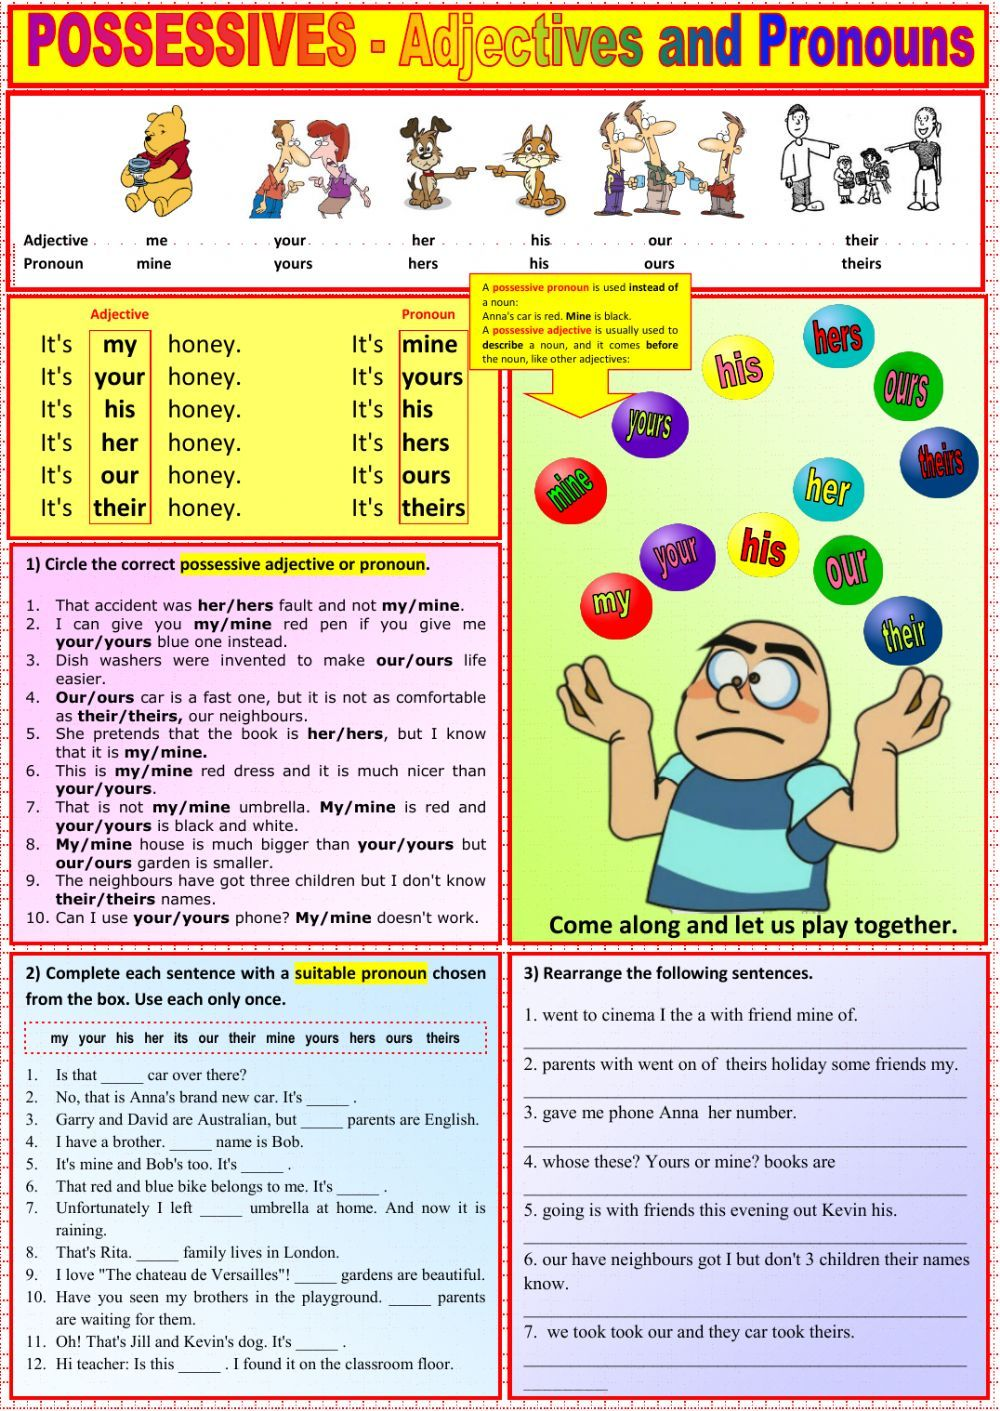 Possessive Adjectives And Pronouns Interactive And Downloadable Worksheet Check Your A Posesivos En Ingles Pronombres En Inglés Actividades Con Los Pronombres